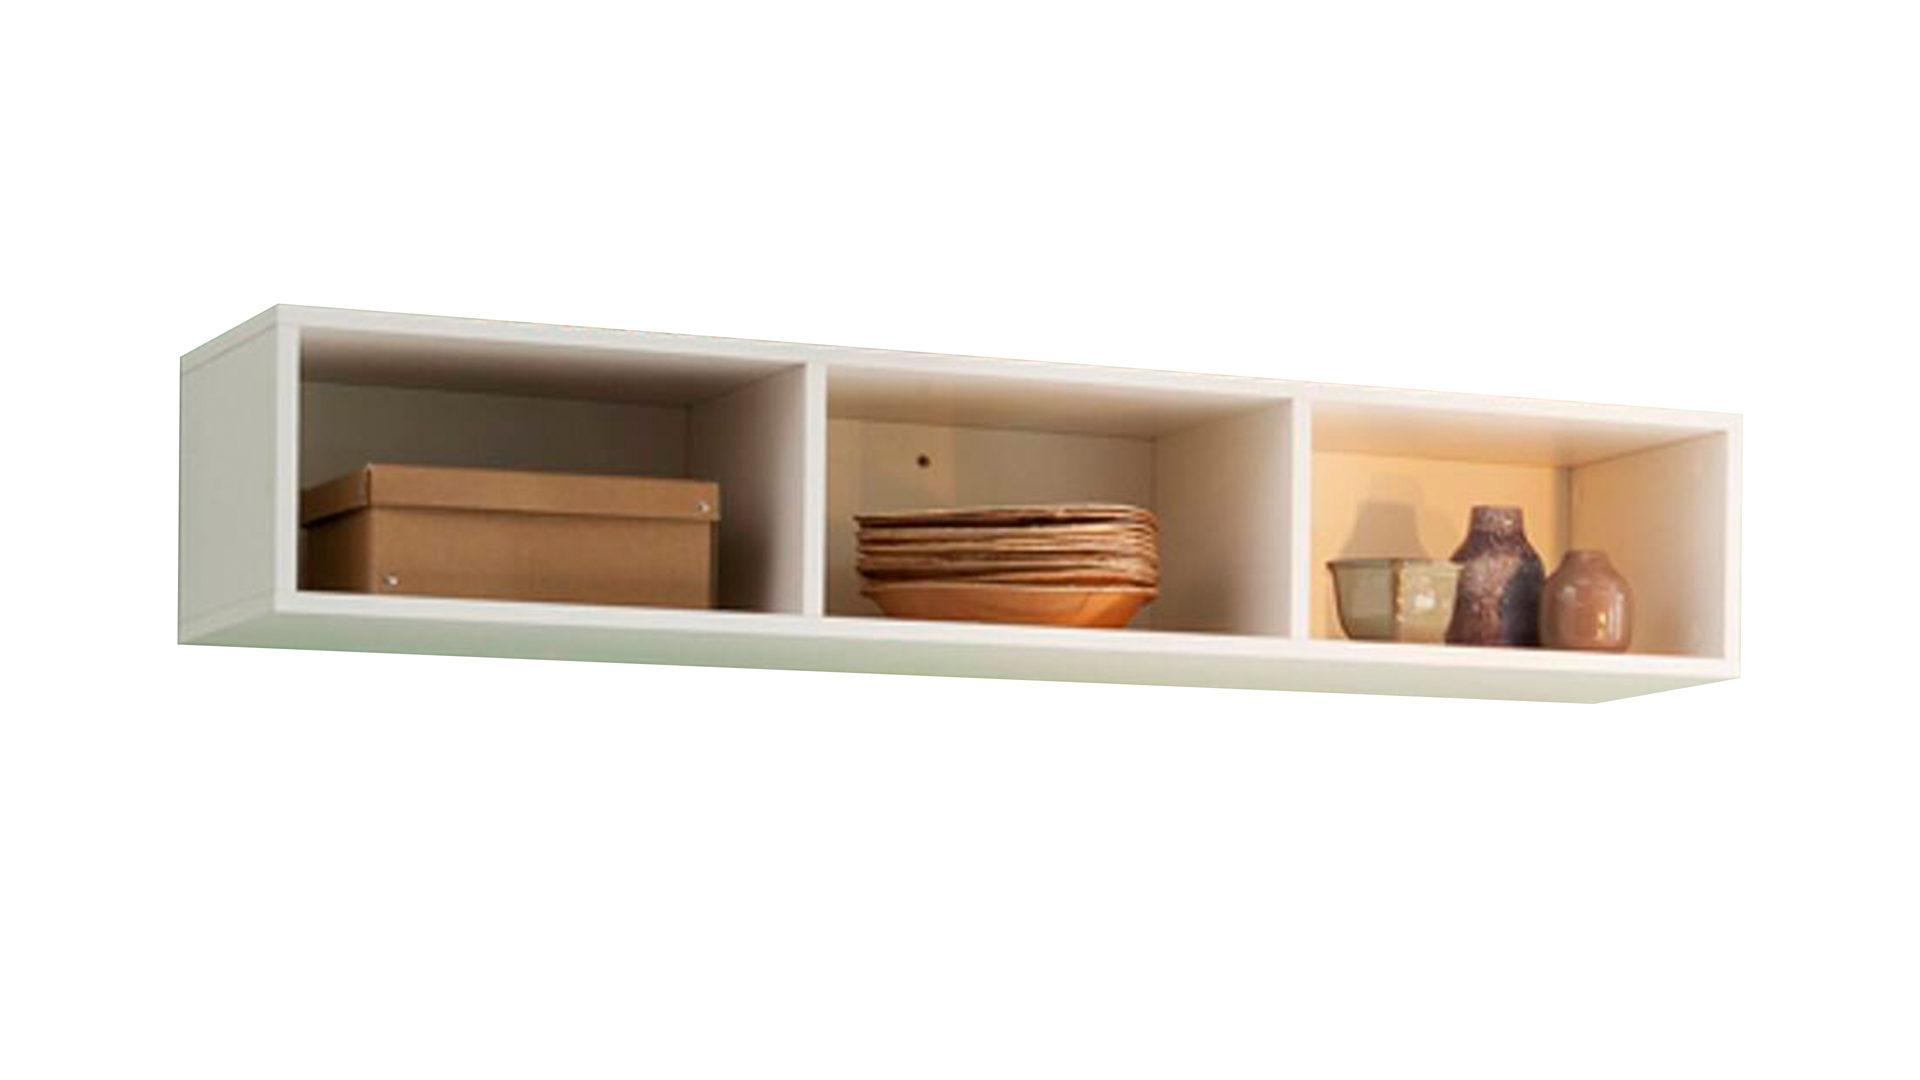 Möbel Bernskötter Mülheim, Räume, Wohnzimmer, Regale + Raumteiler,  Boxen Wandregal, Boxen Wandregal, Mattweiße Lackoberflächen U2013 Länge Ca. 120  Cm